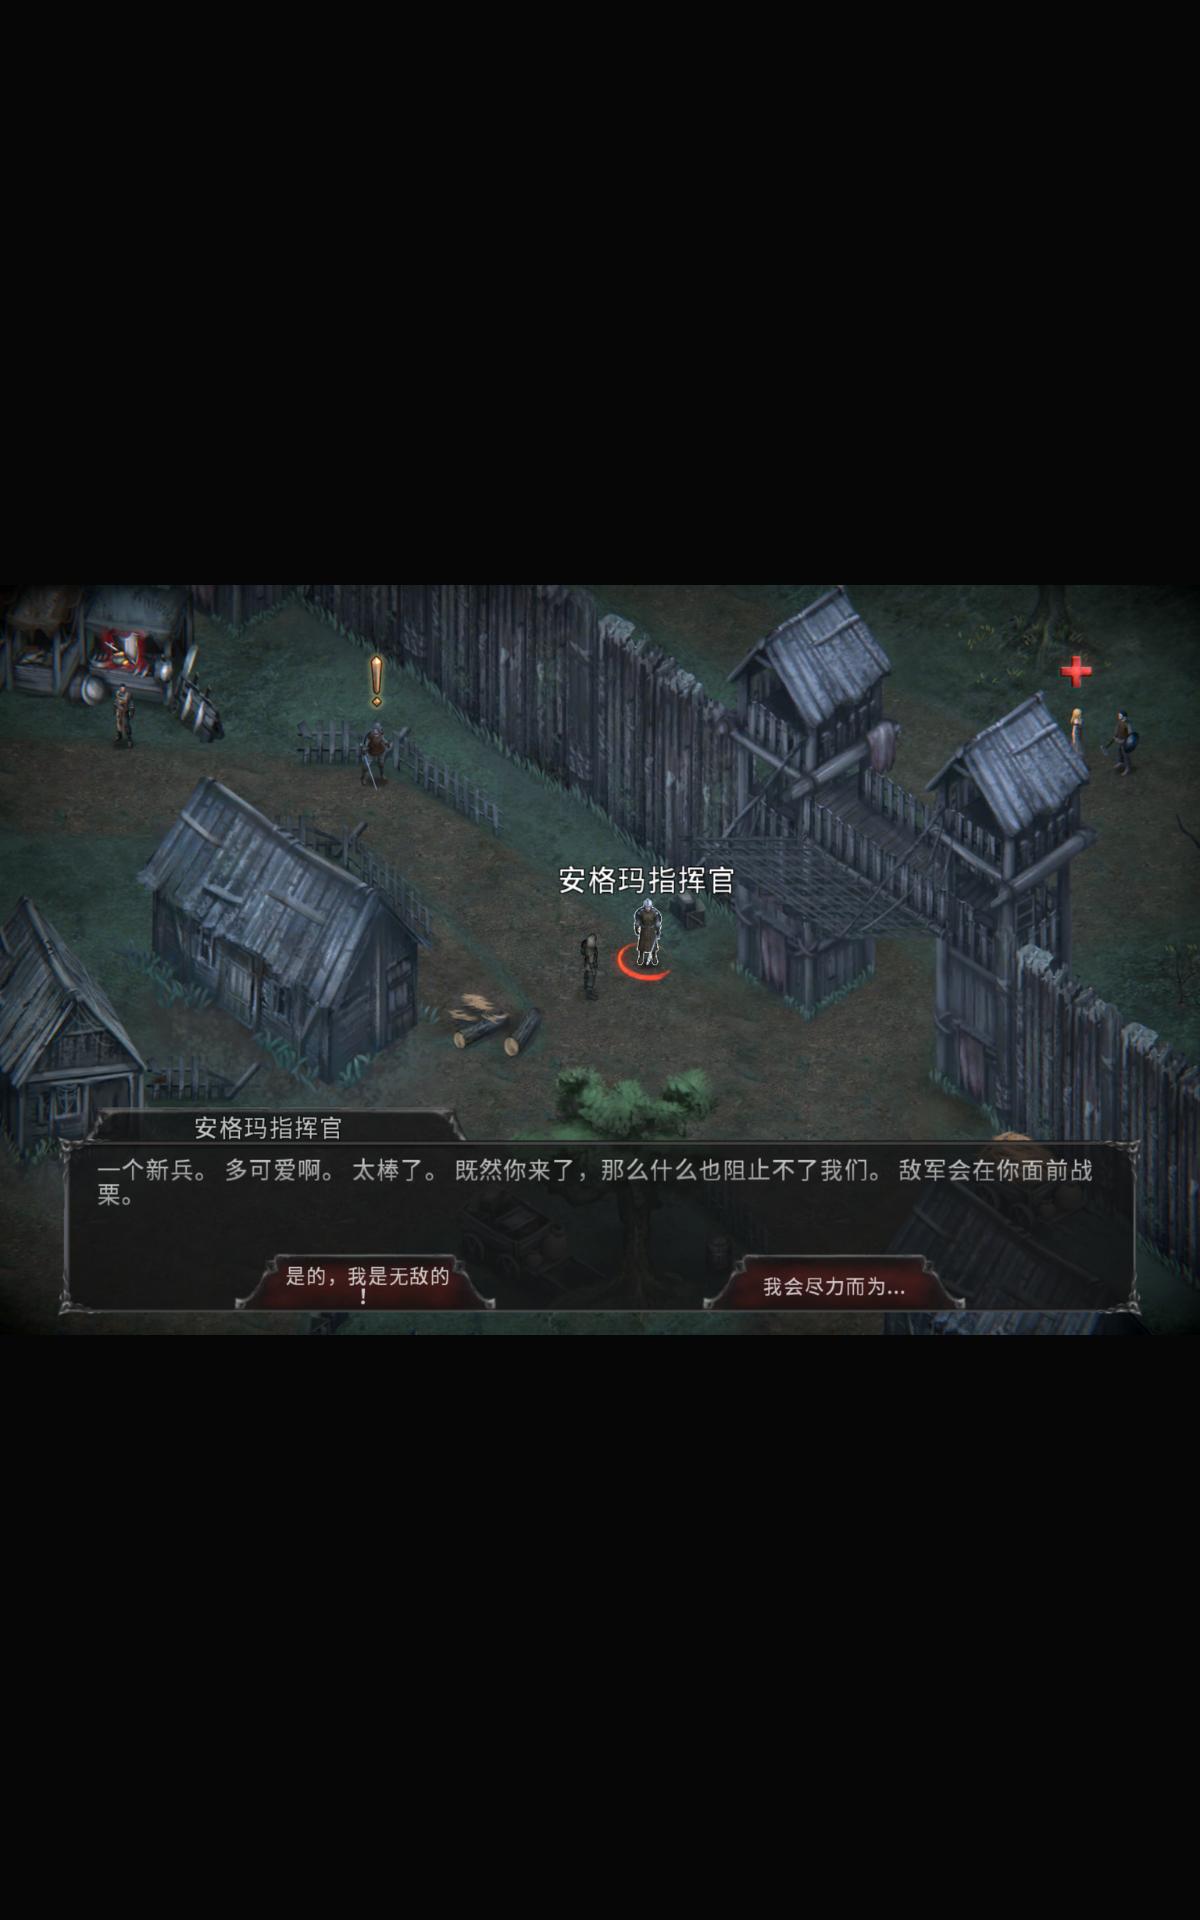 Screenshot 2: 吸血鬼之殇:起源 - 中世纪角色扮演游戏